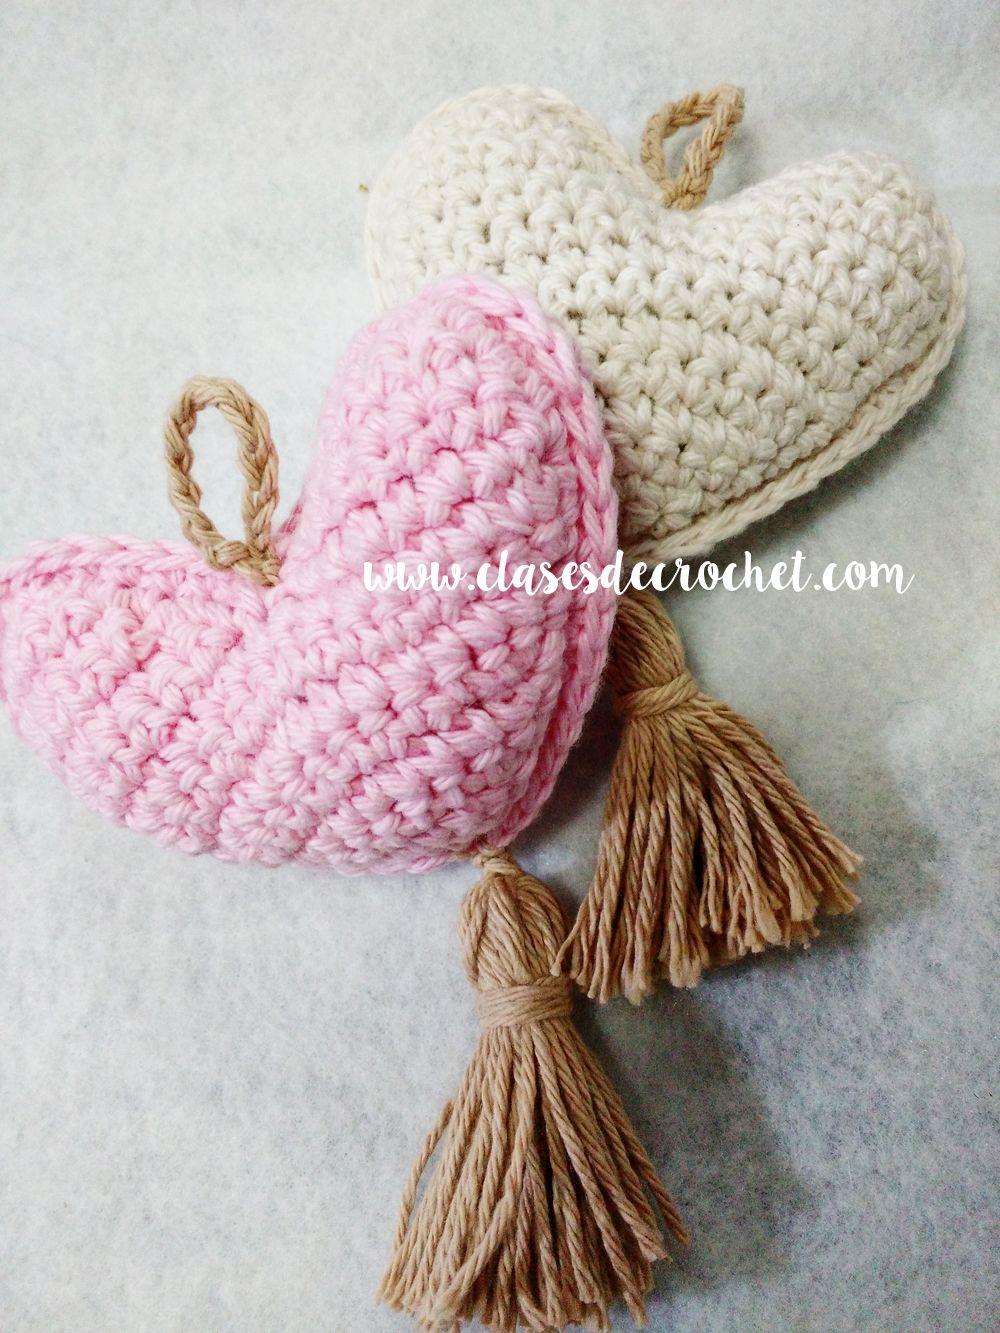 patrones gratis crochet | Trapillo | Pinterest | Patrón gratis ...